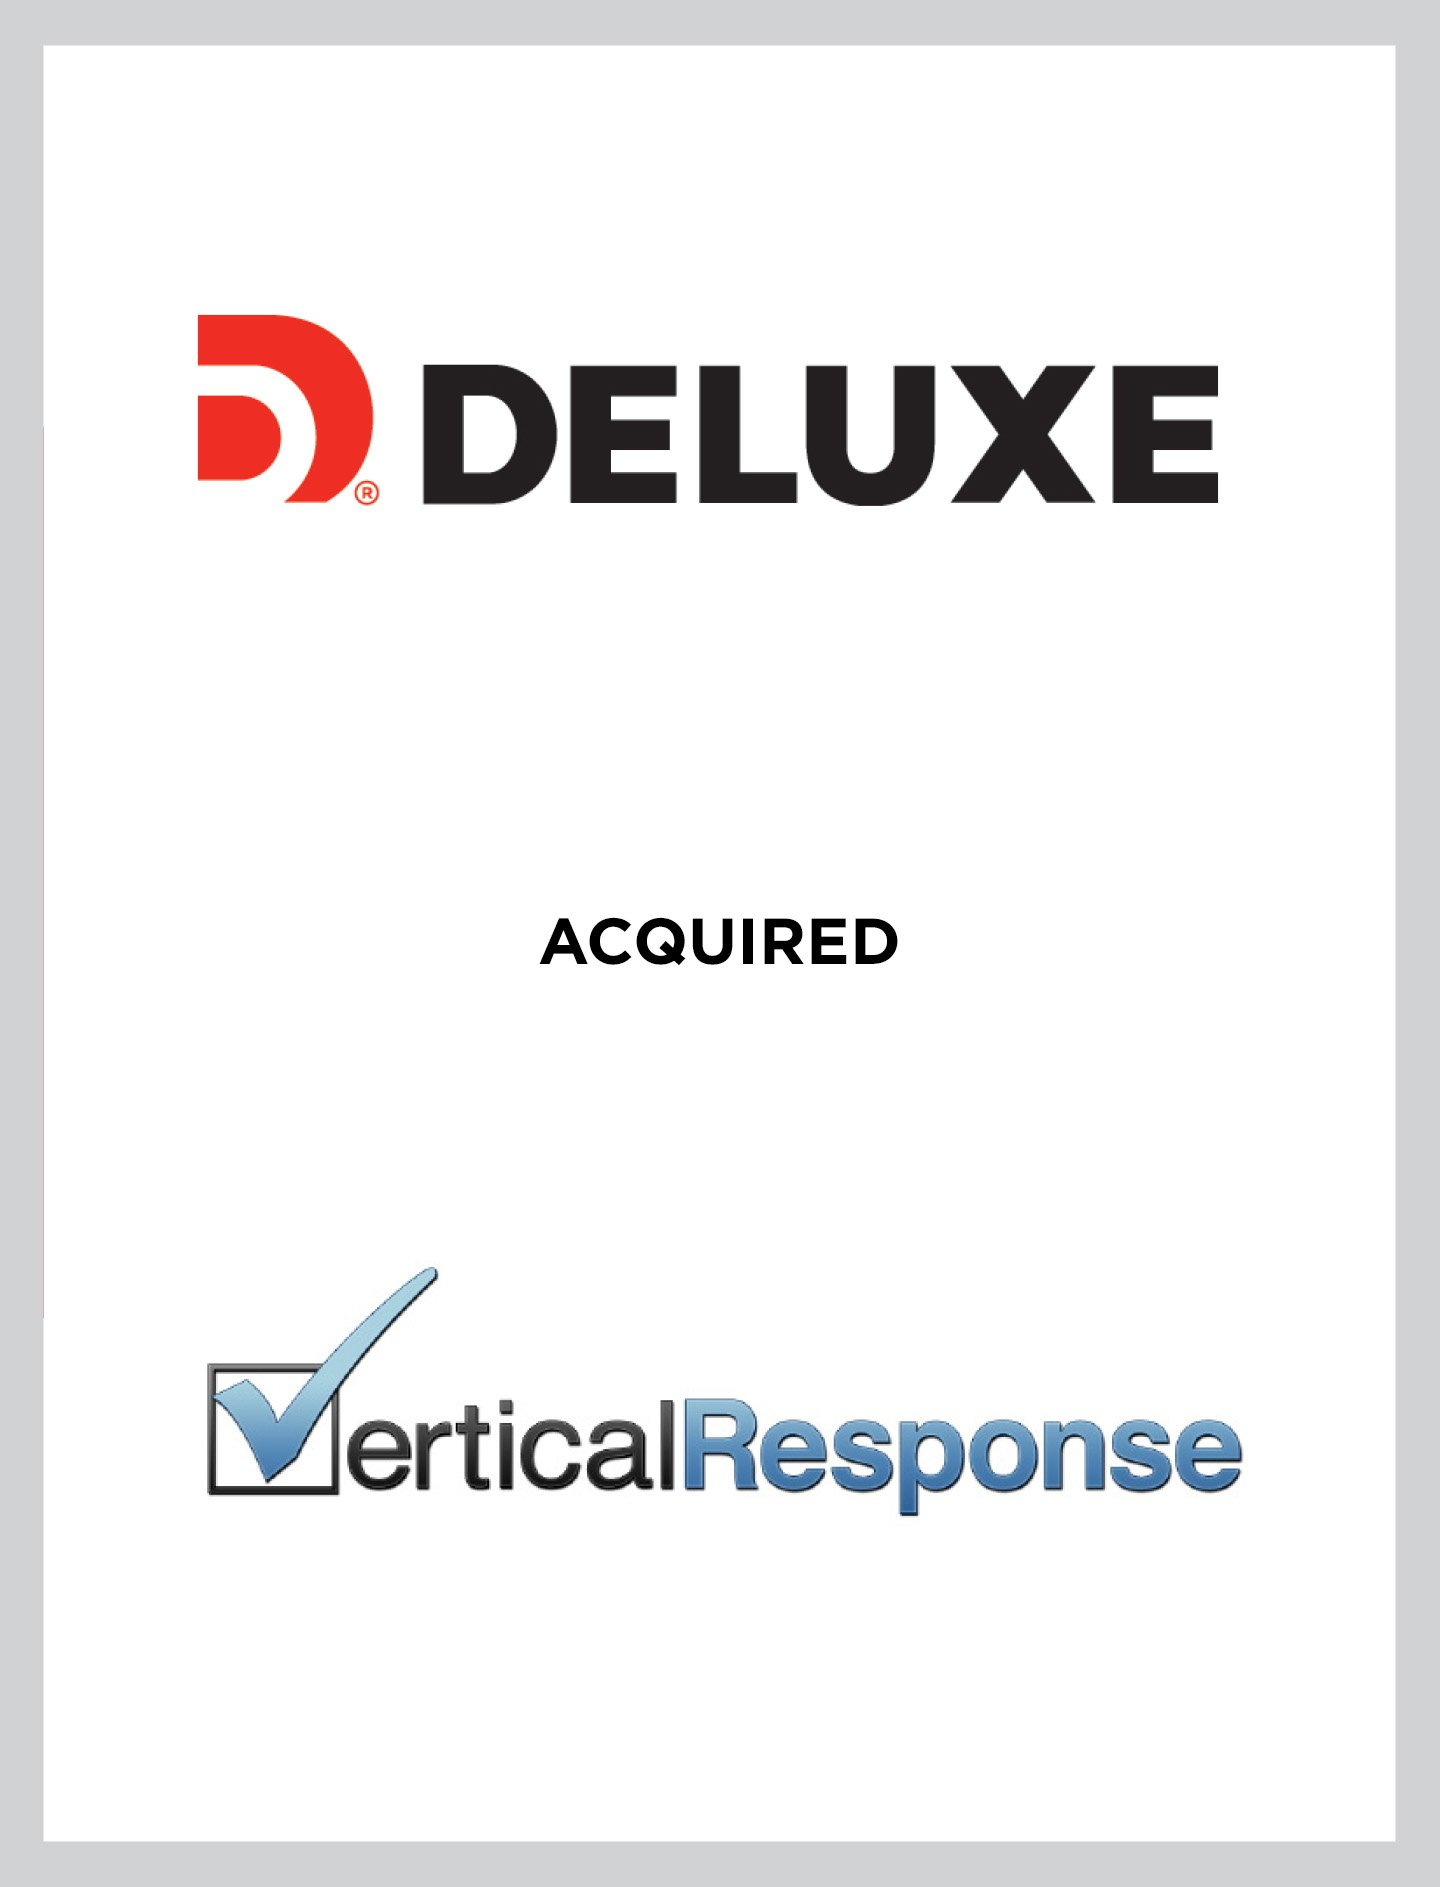 Vertica Response